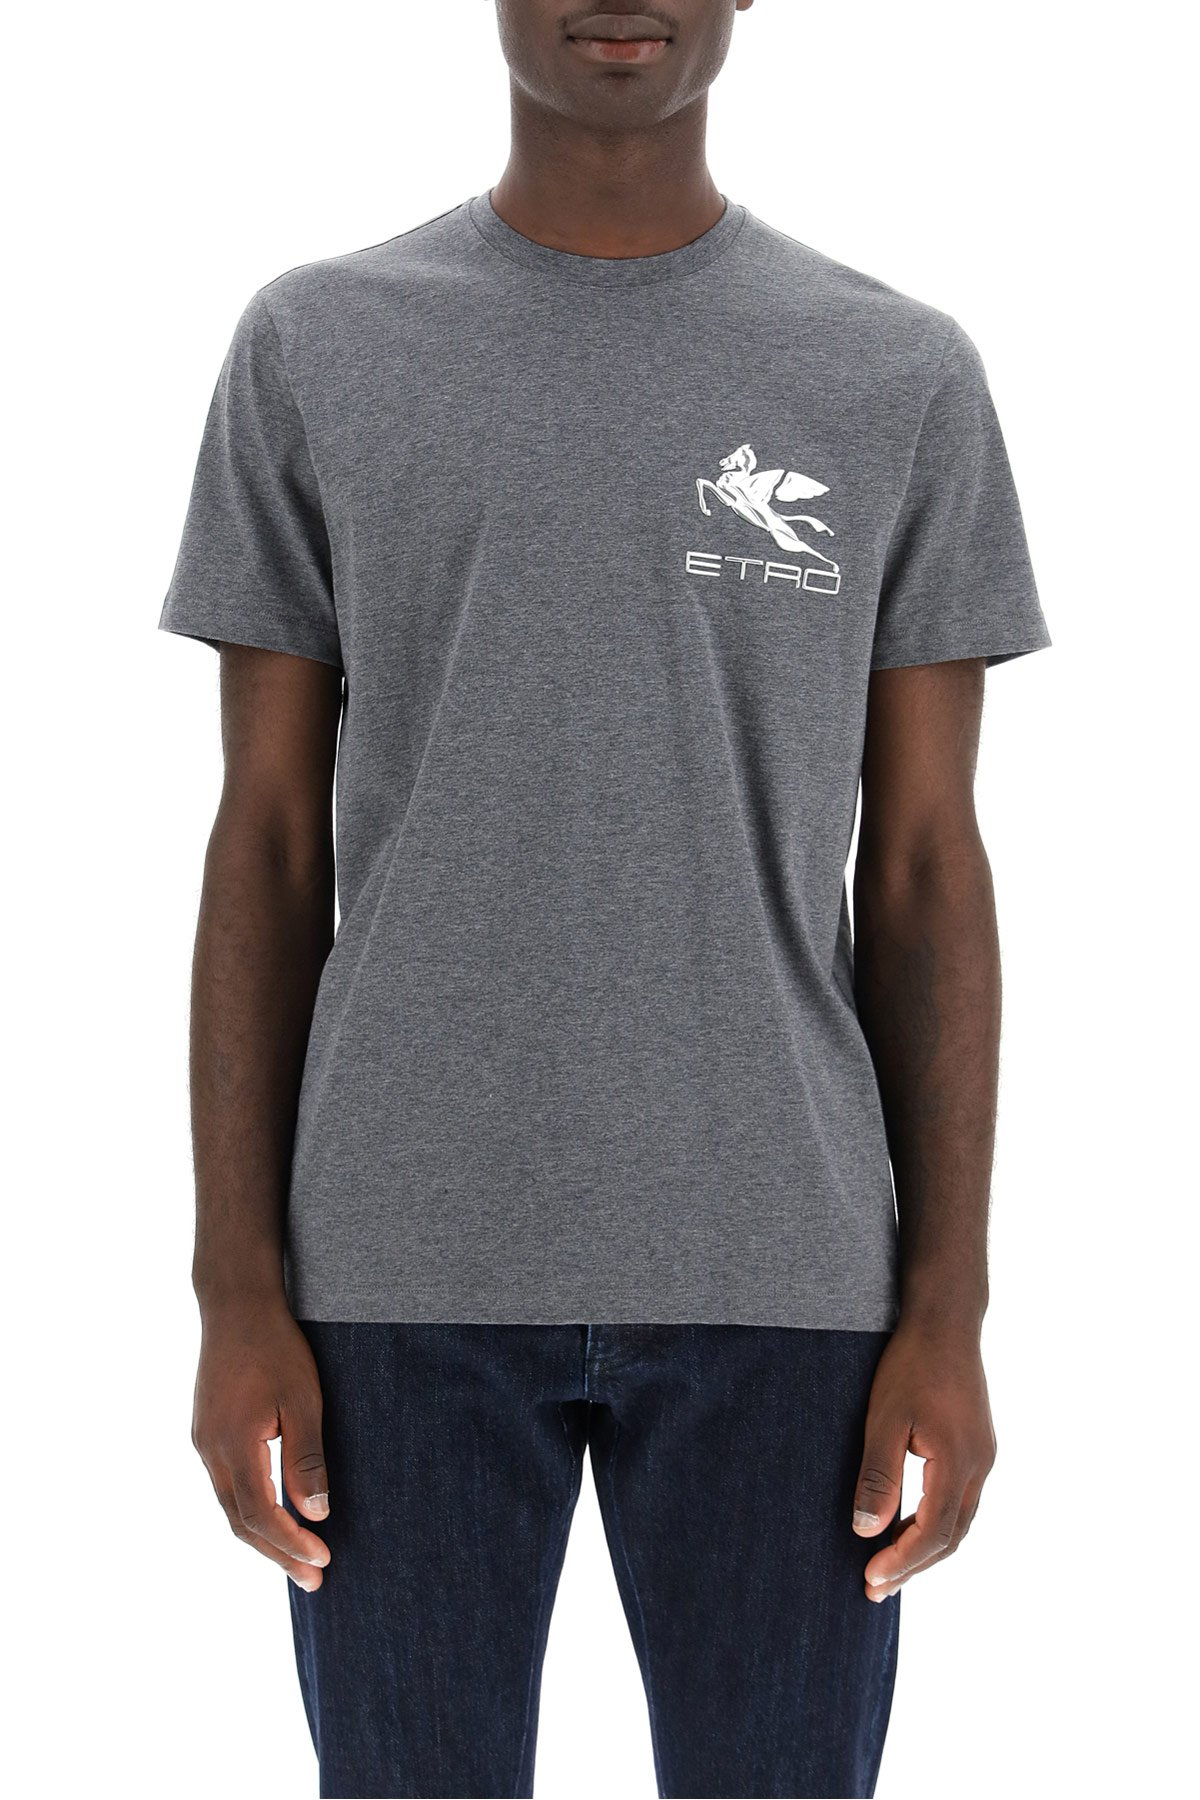 Etro t-shirt patch pegaso